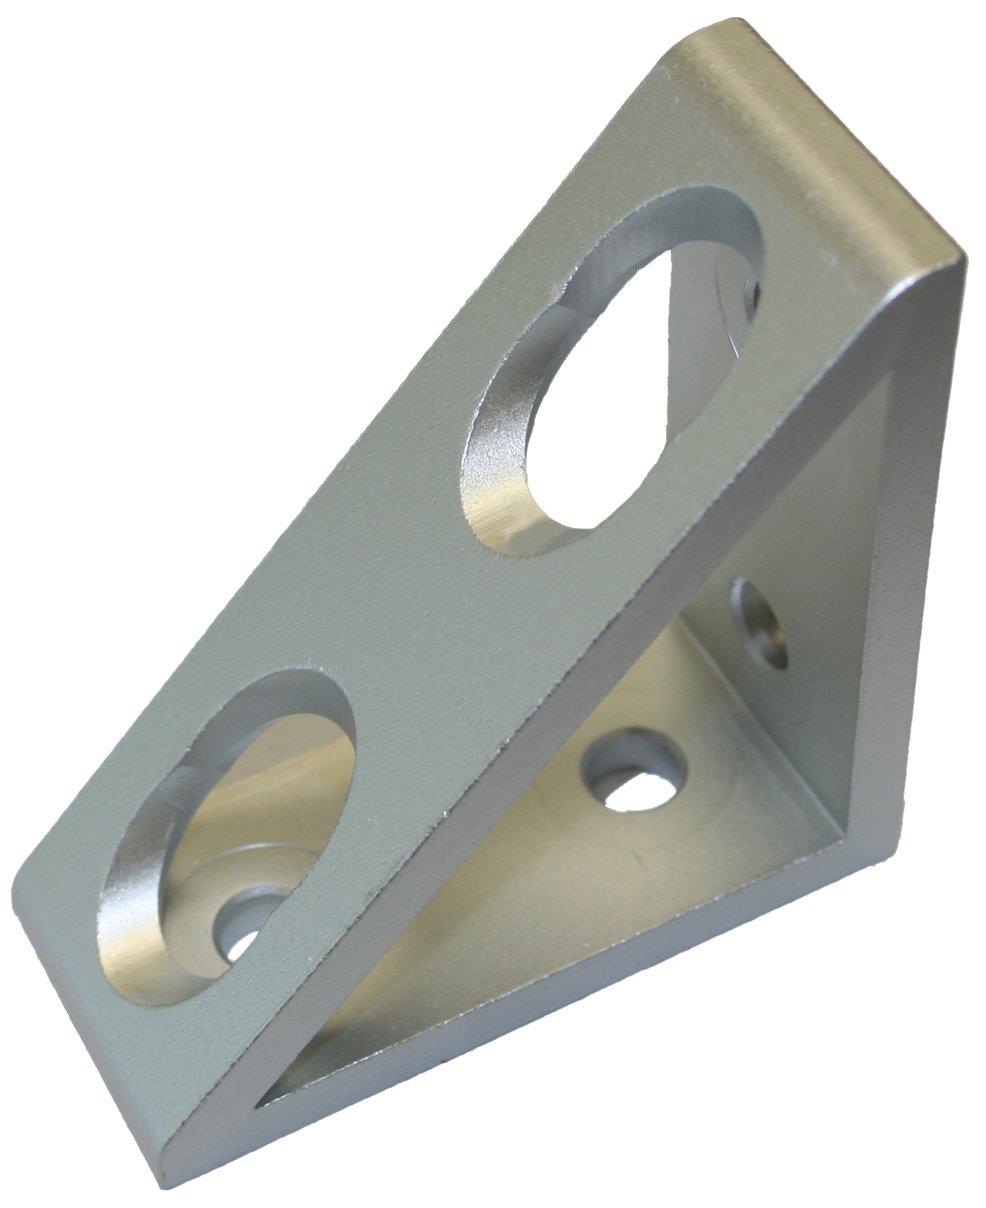 Faztek 15 Series Aluminum 6063-T6 4 Hole Inside Gusset Corner Bracket, Clear Anodize, 1-19/64'' Width x 3'' Length